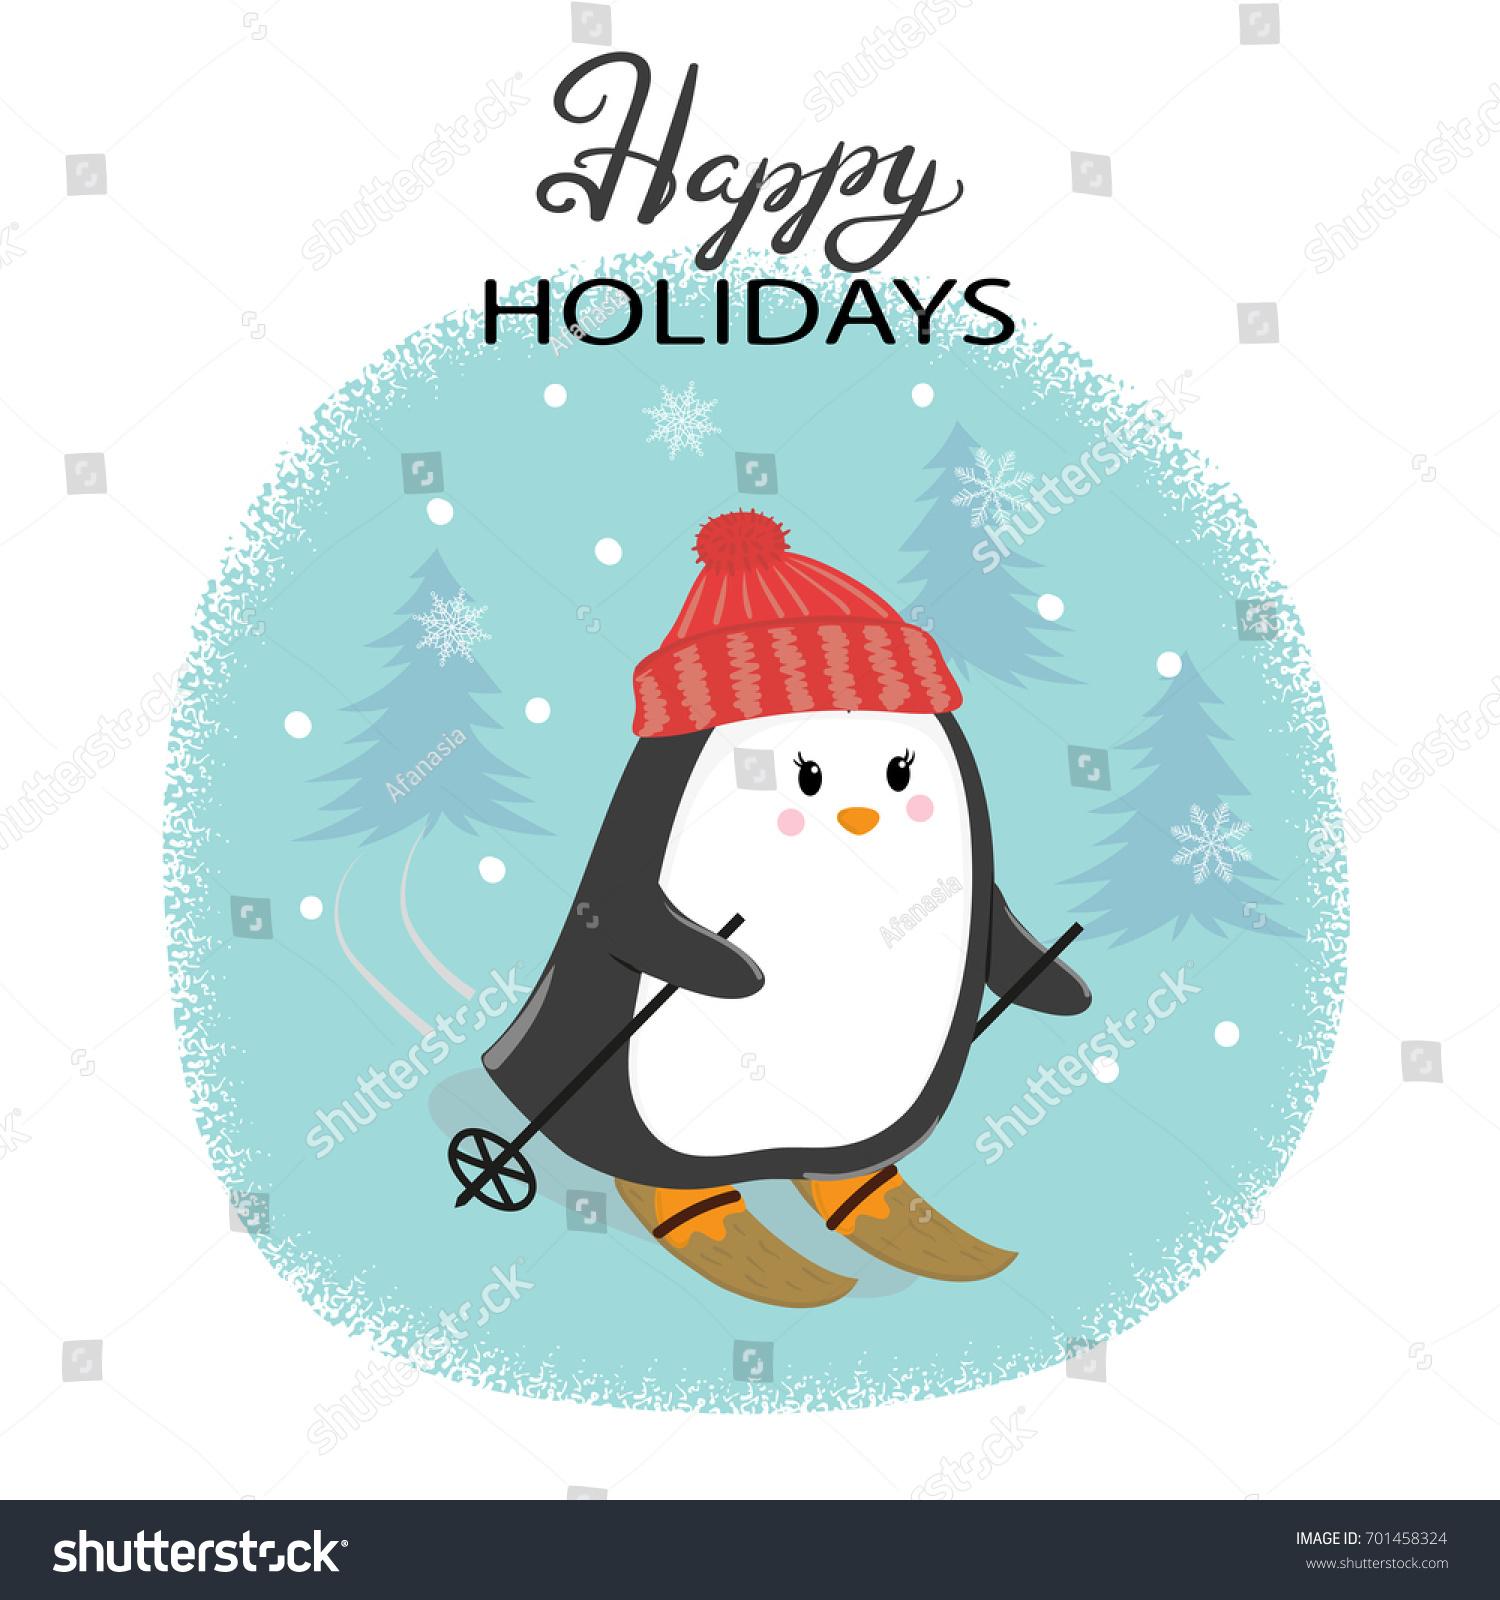 Merry Christmas Card Cute Skiing Penguin Stock Vector (Royalty Free ...